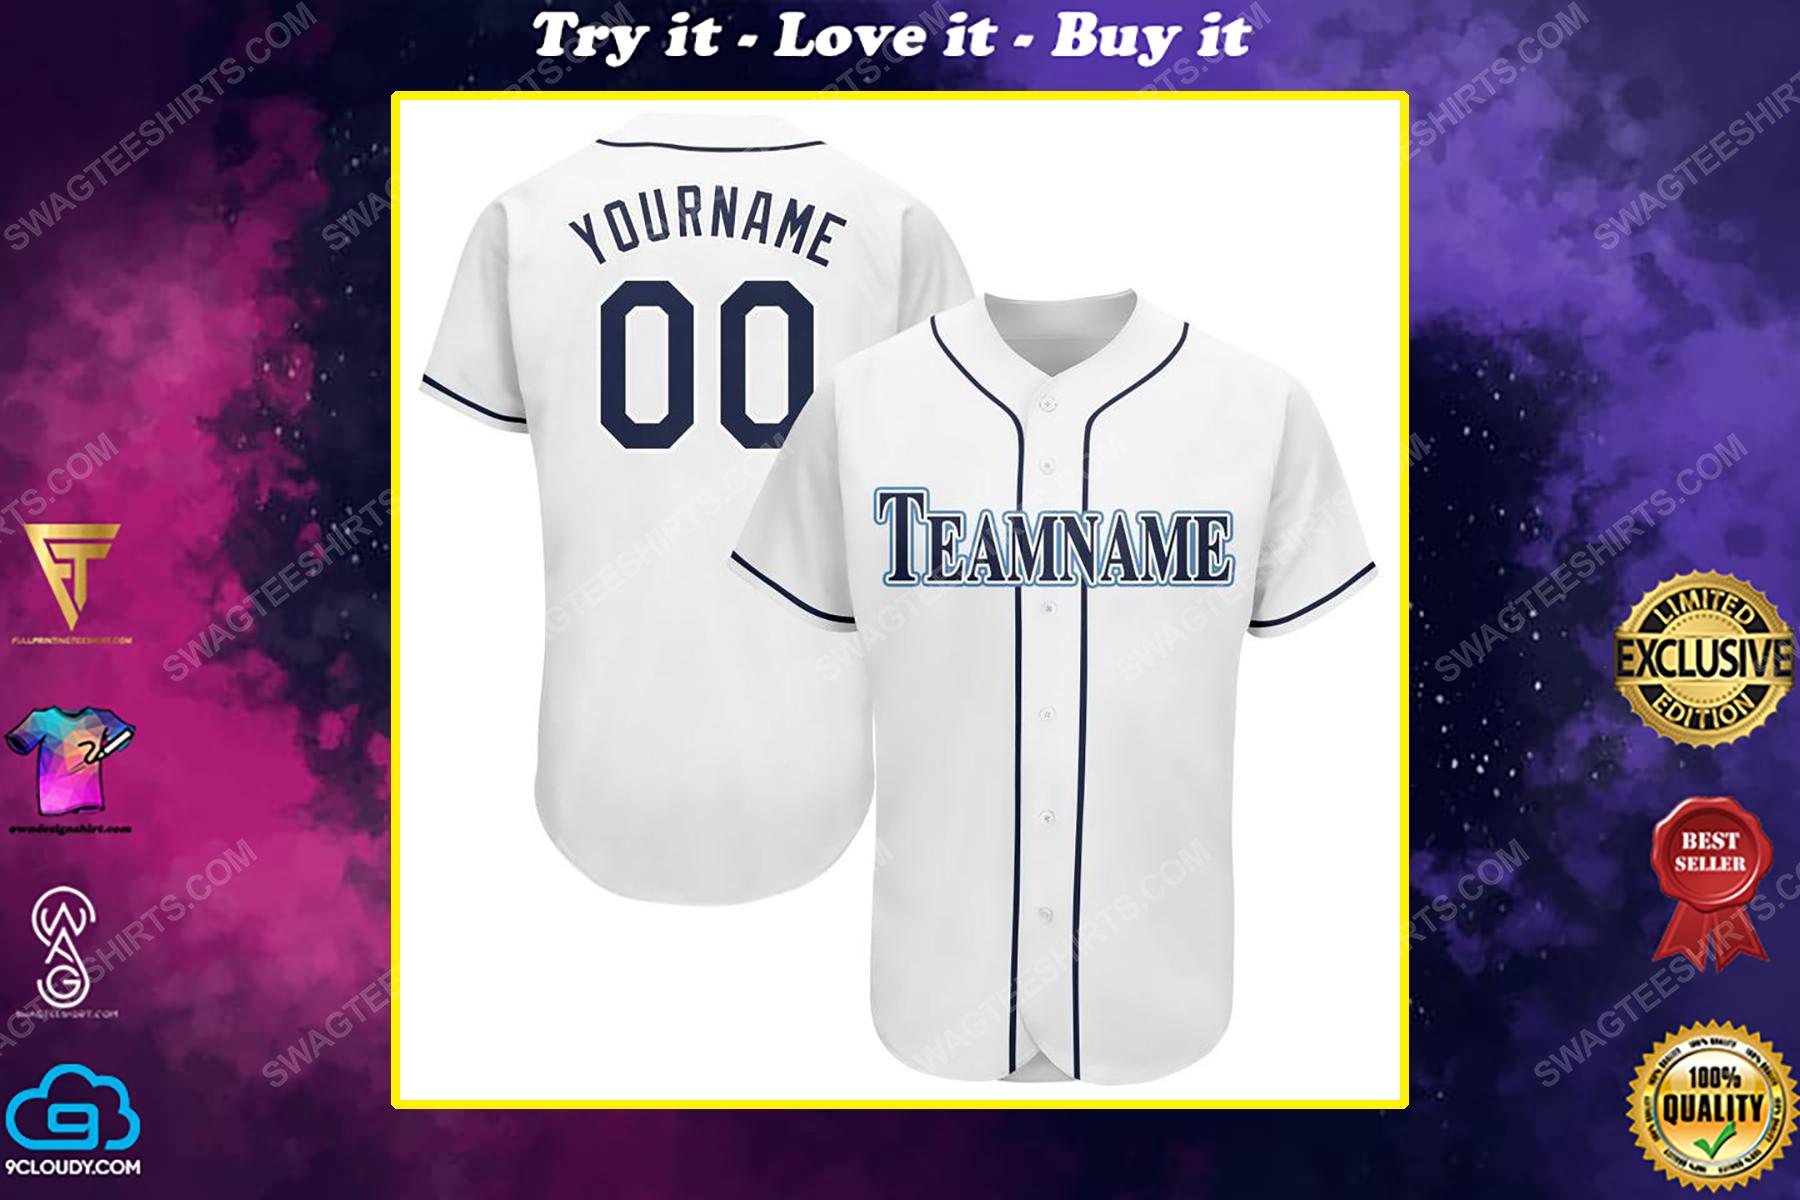 Custom name the tampa bay rays team full printed baseball jersey